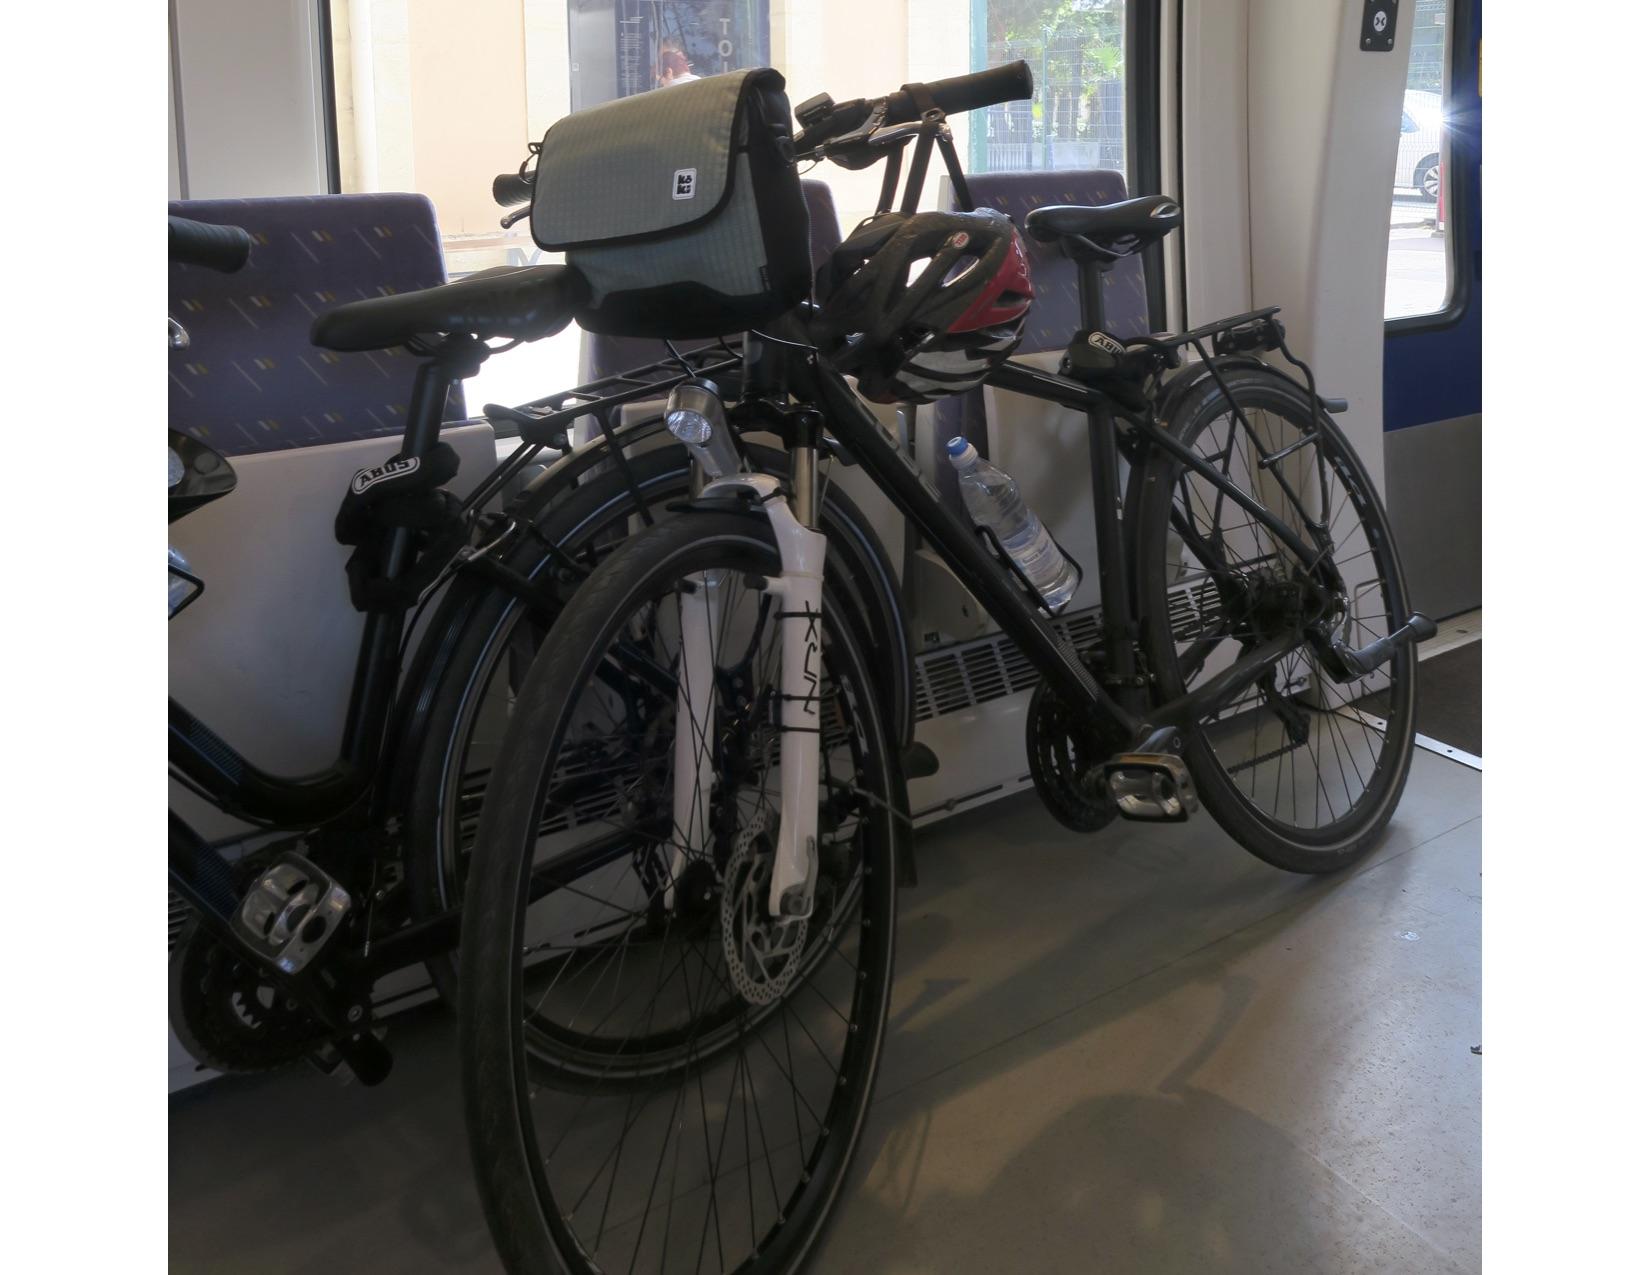 Bikes on train_1.jpg